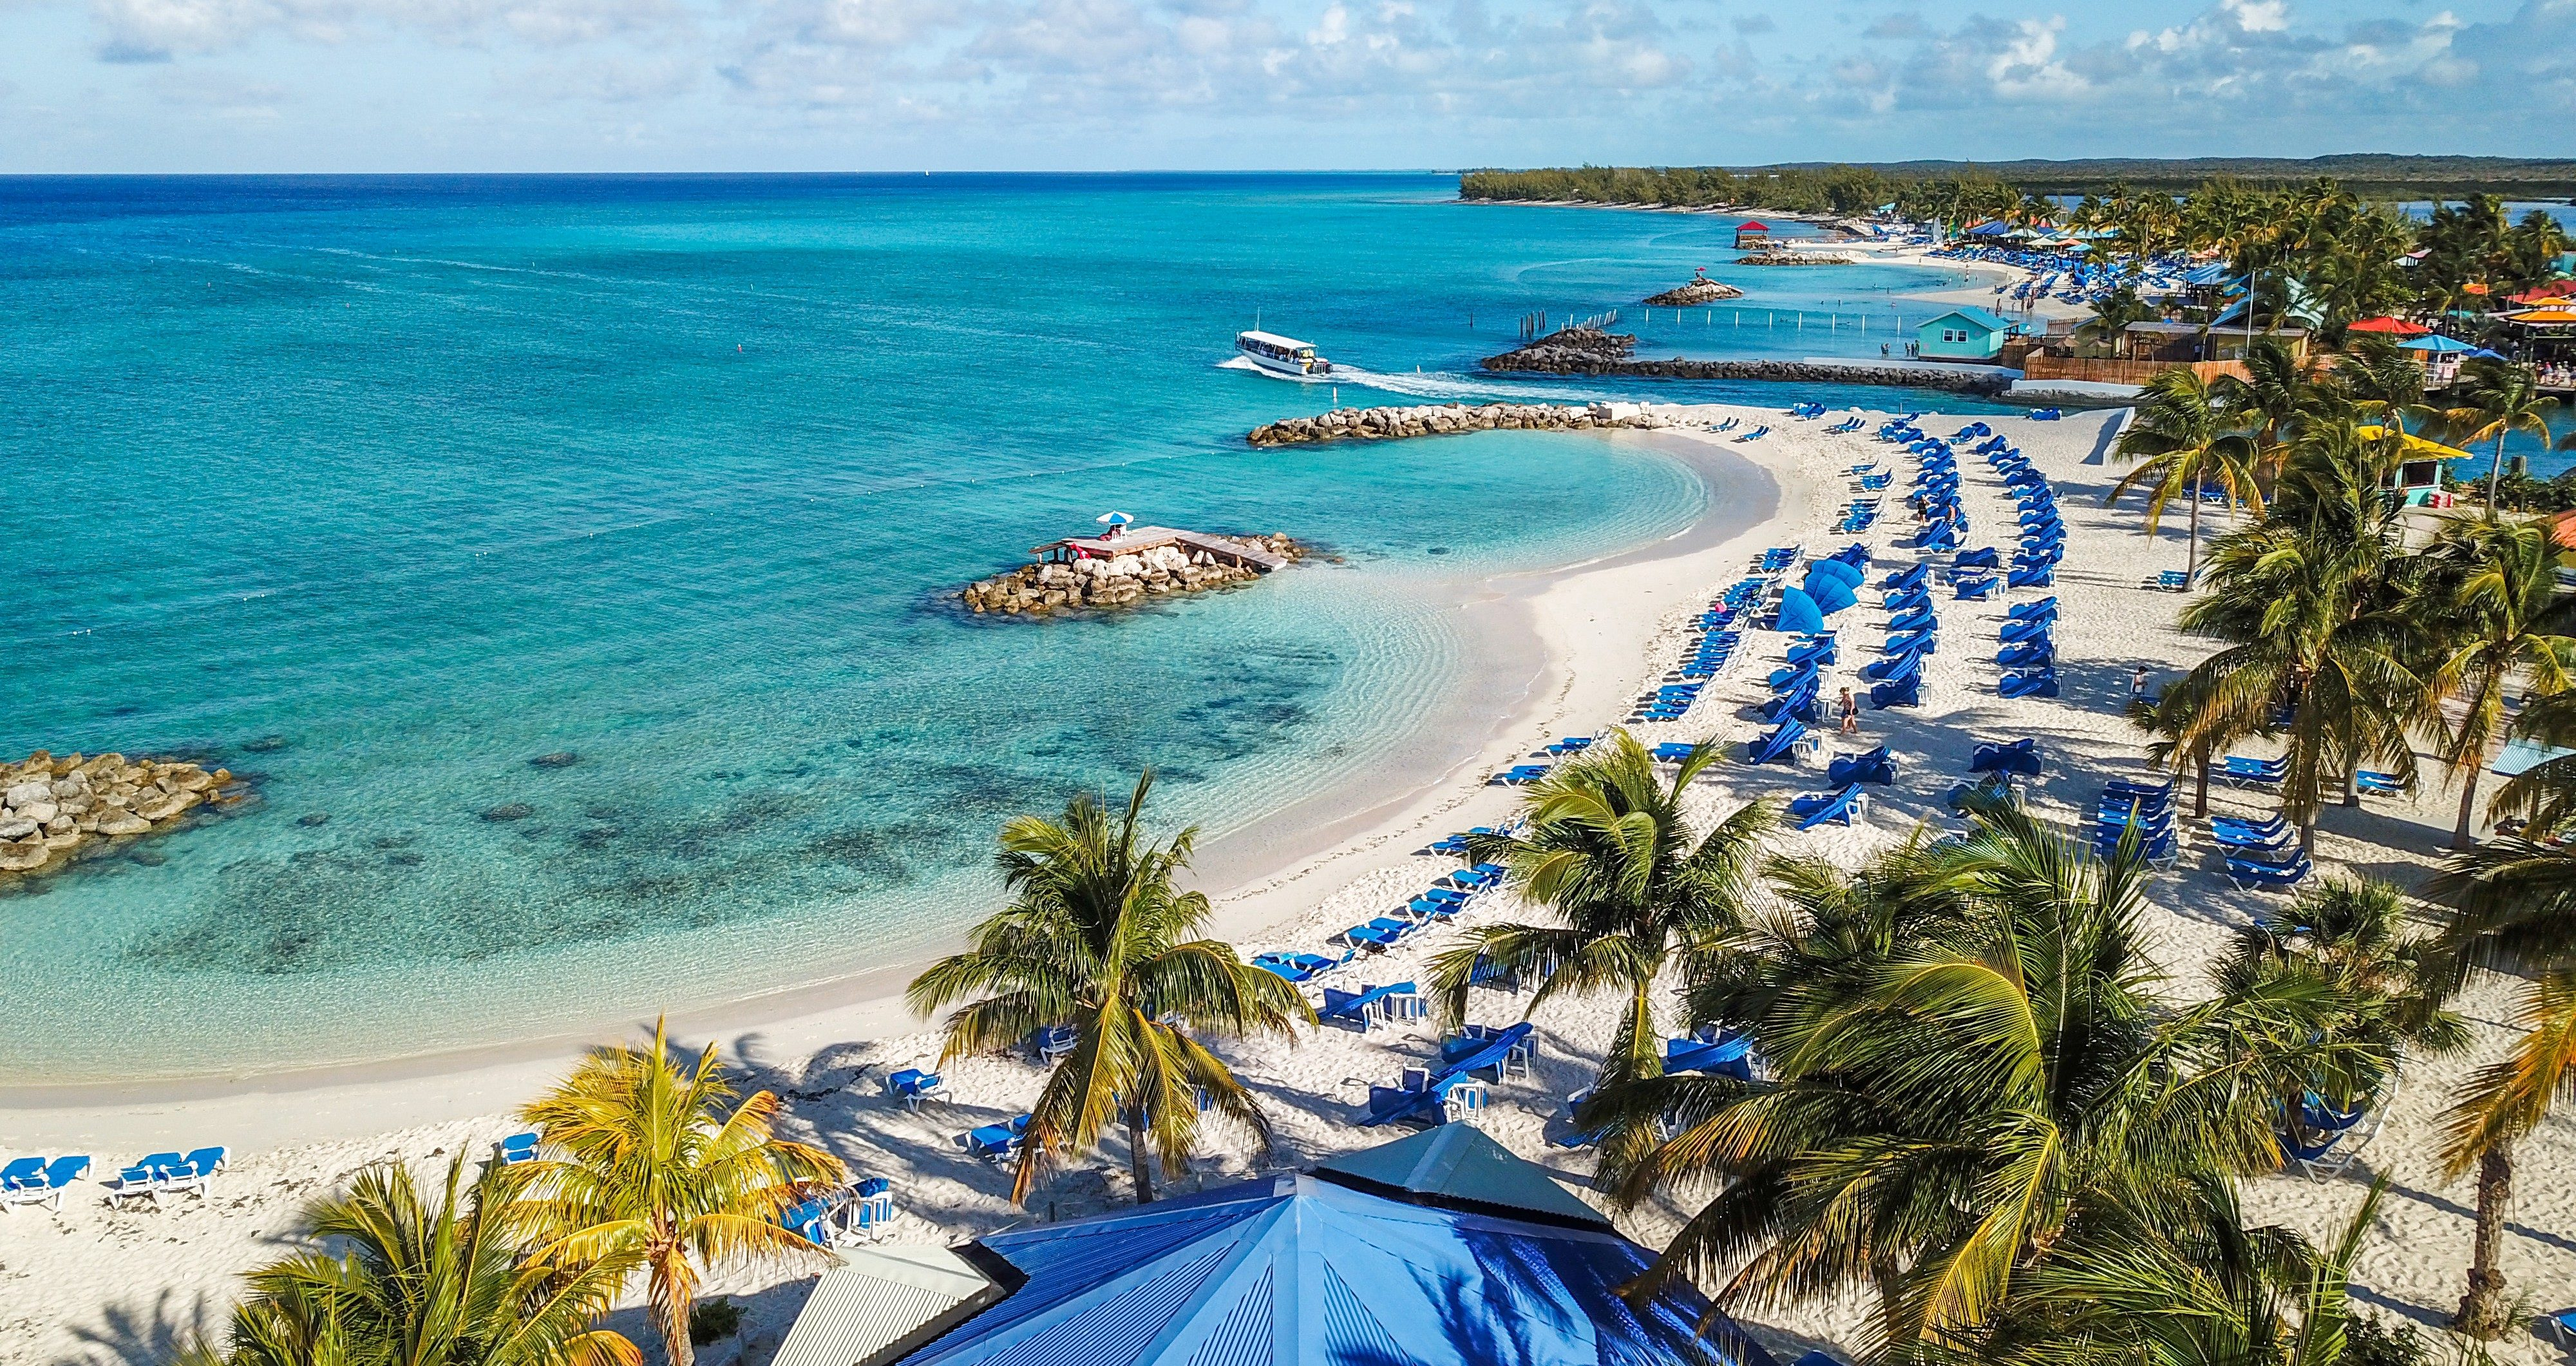 Beautiful drone shoot of idyllic tropical beach of Princess Cays Island in Bahamas